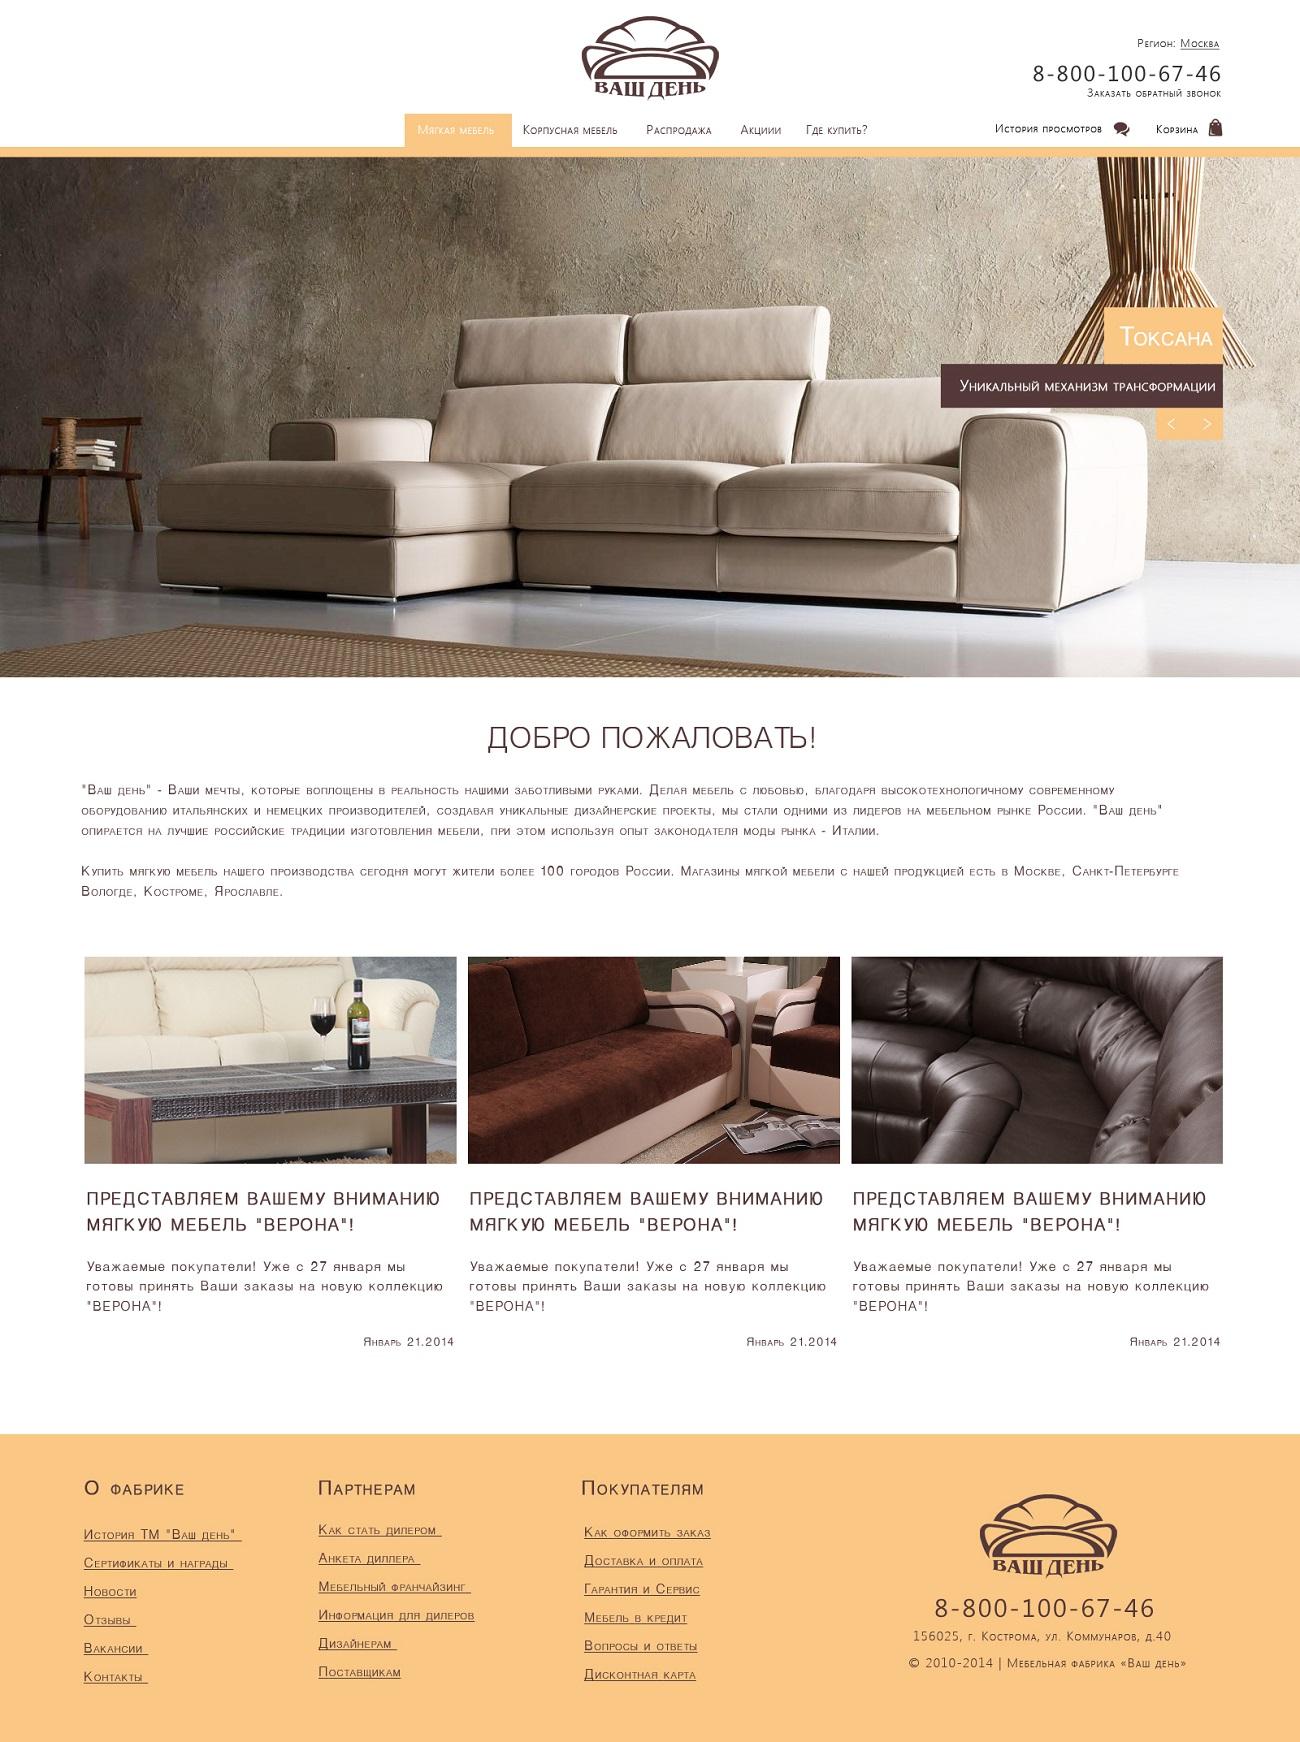 Разработать дизайн для интернет-магазина мебели фото f_03352e92deb6a784.jpg